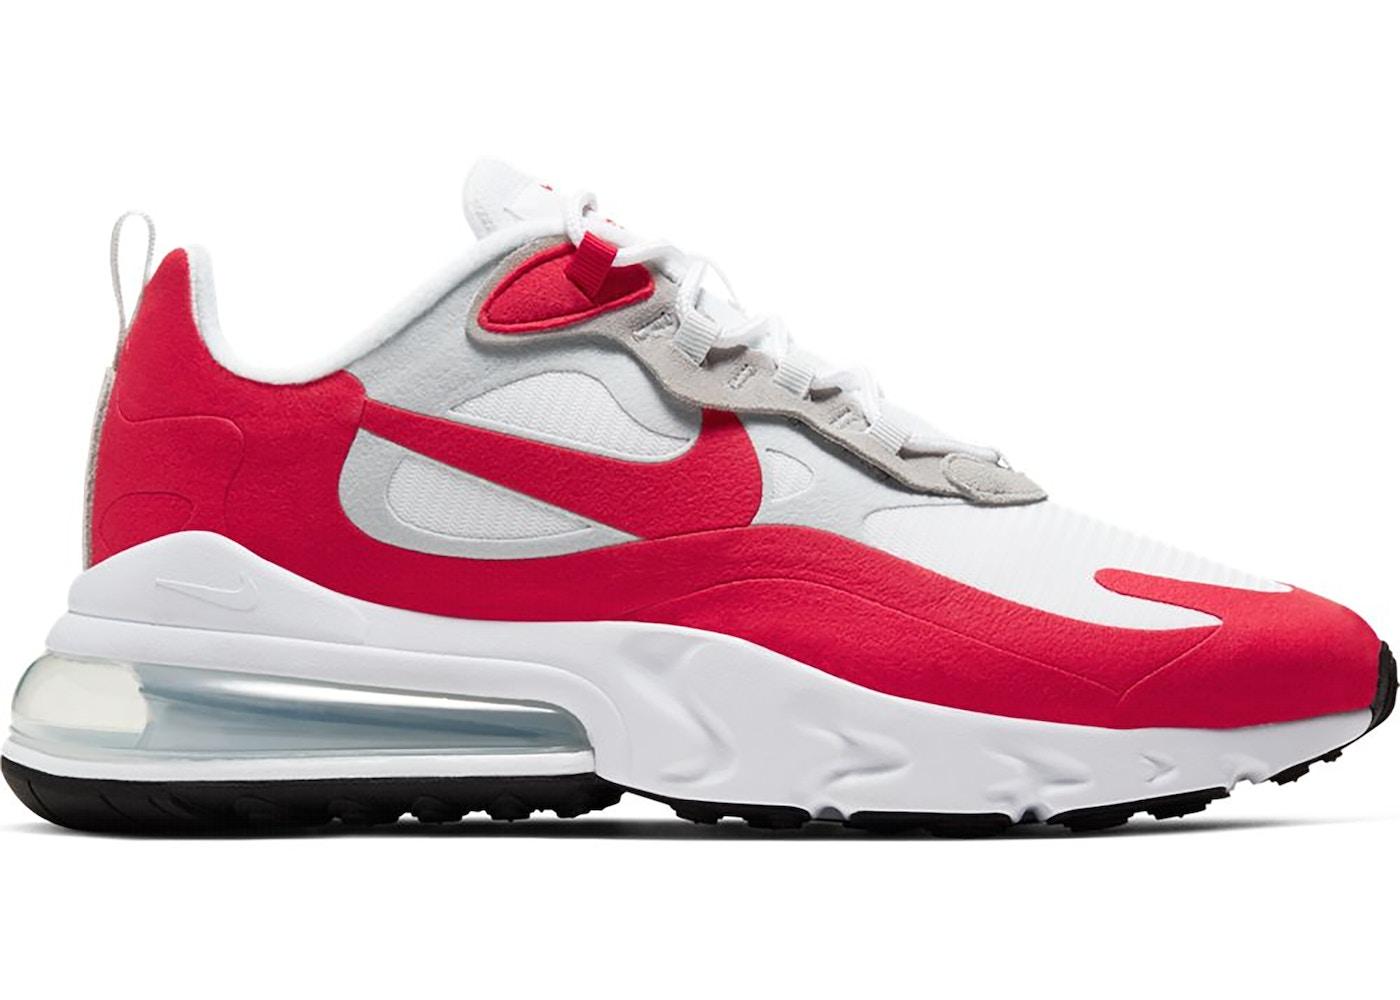 Nike Air Max 270 React White University Red Cw2625 100